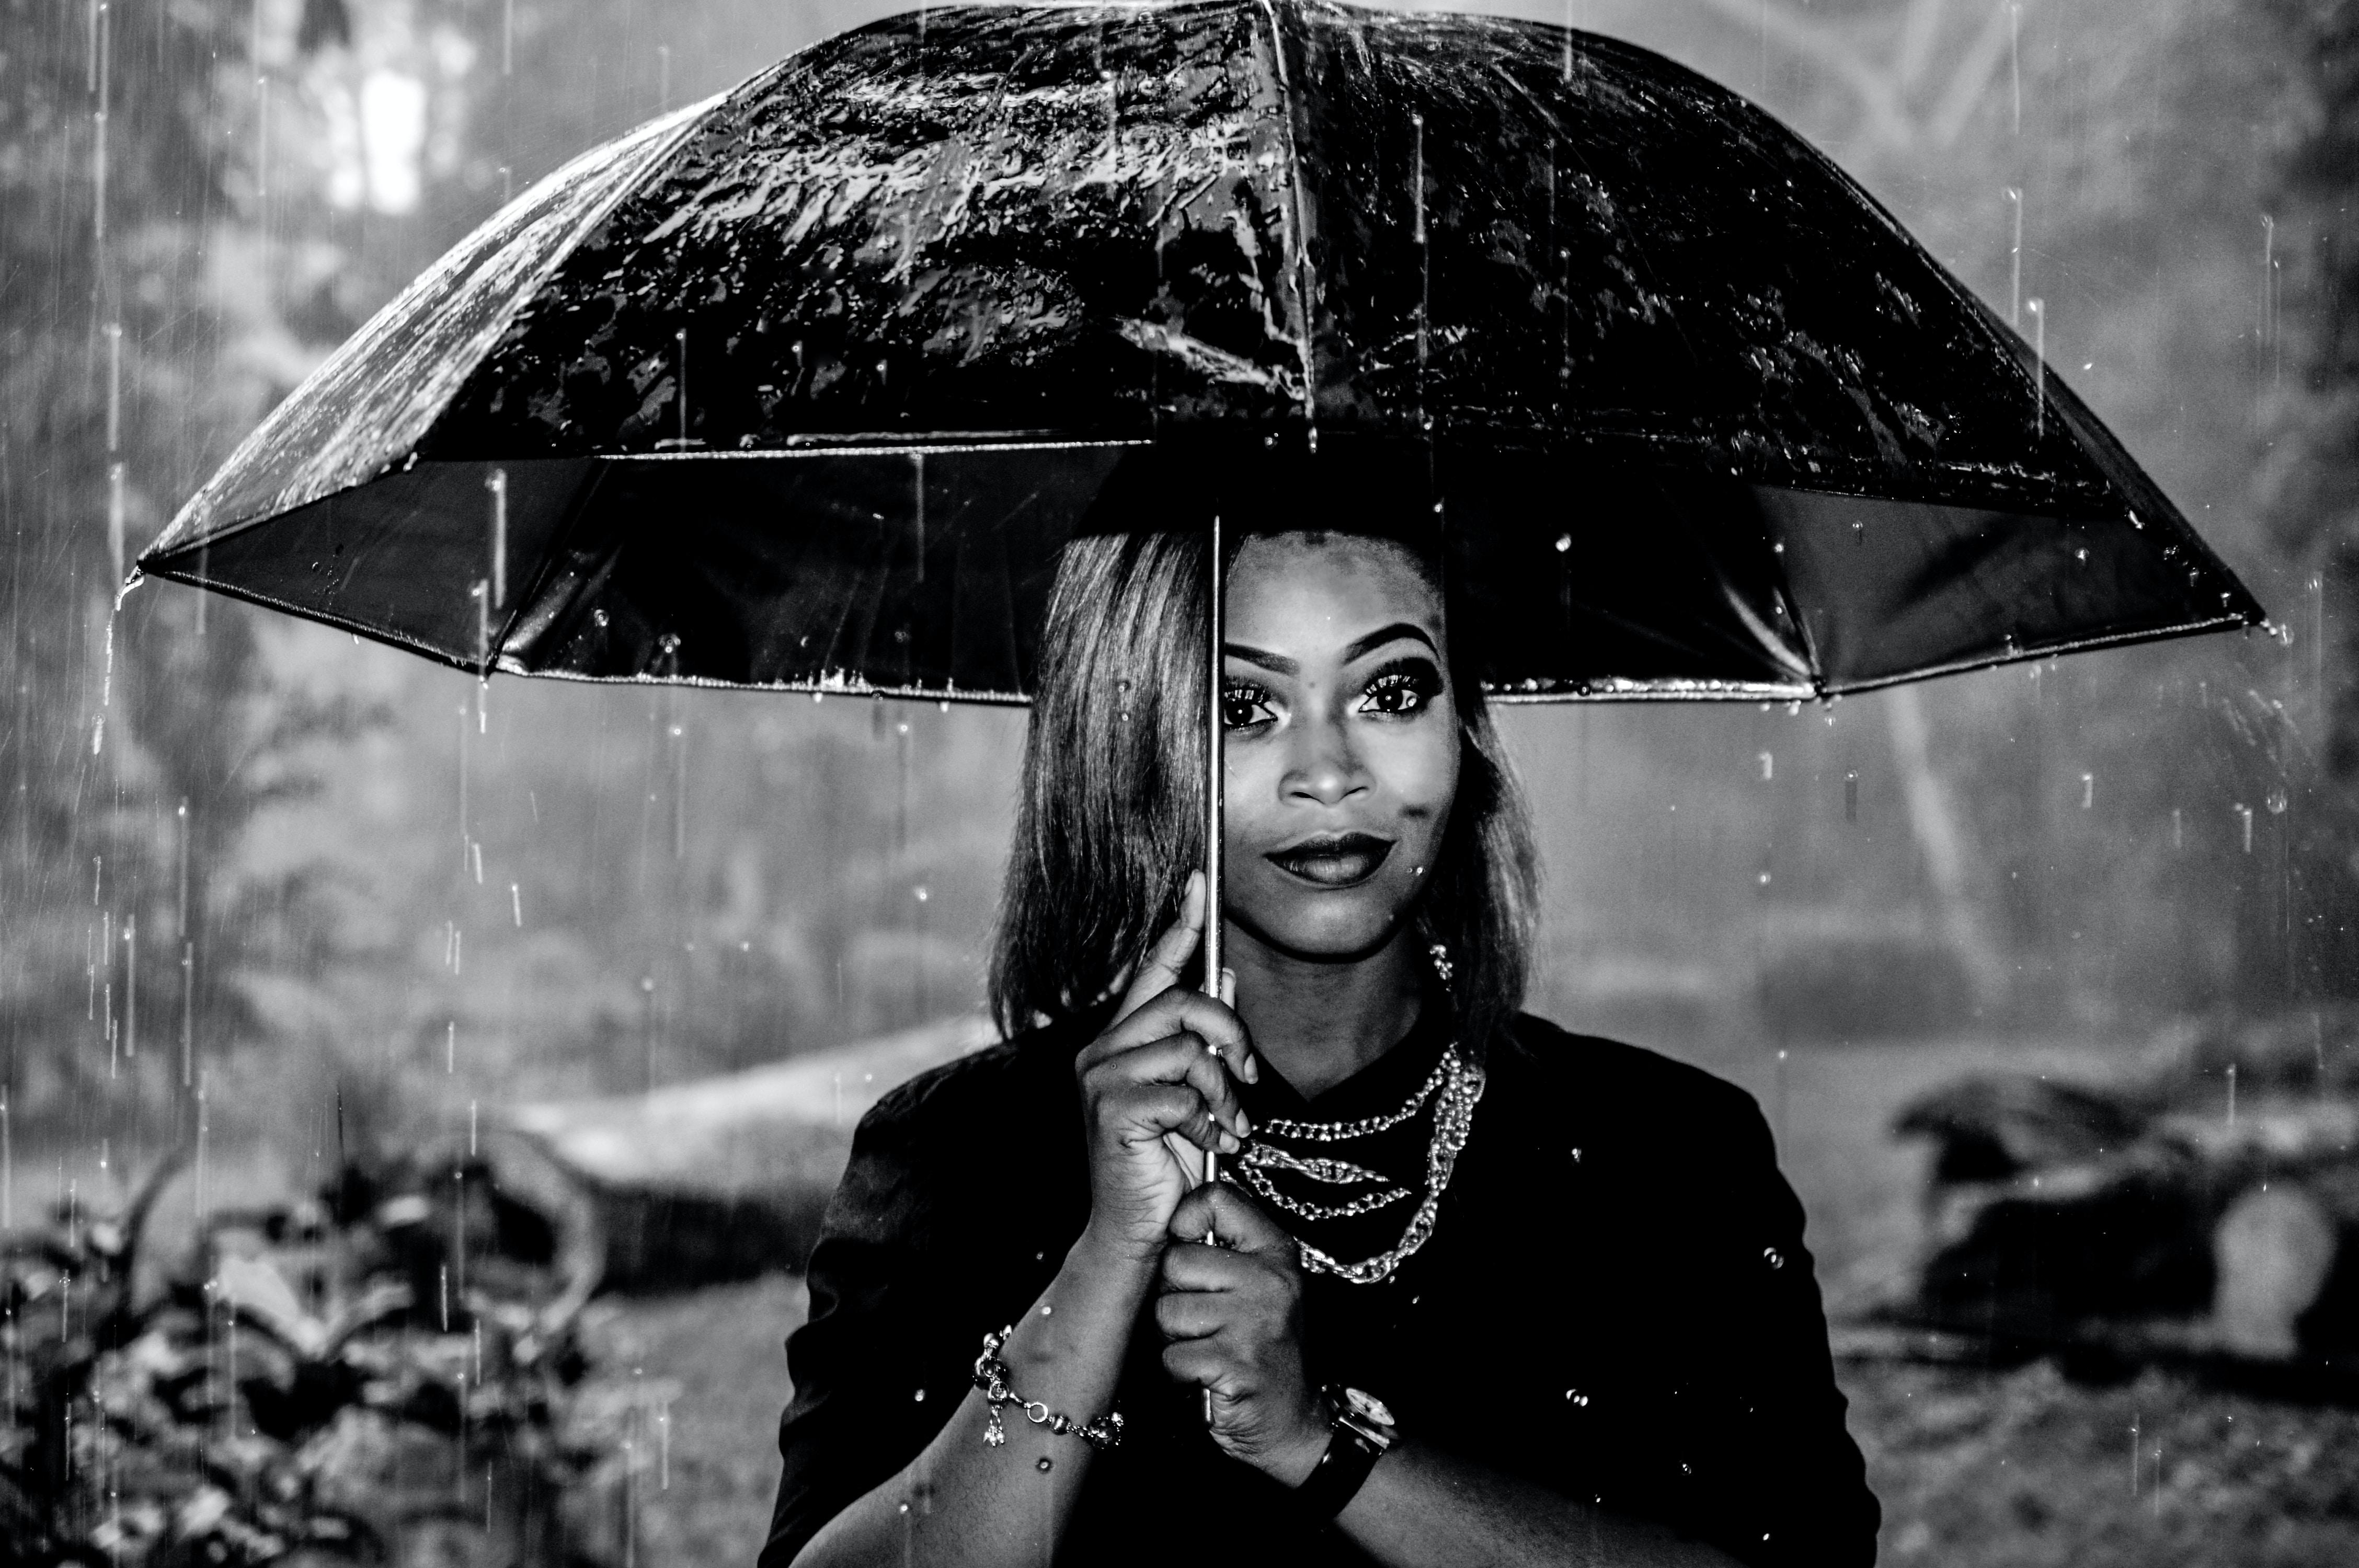 grayscale photography of woman under umbrella at rainy season